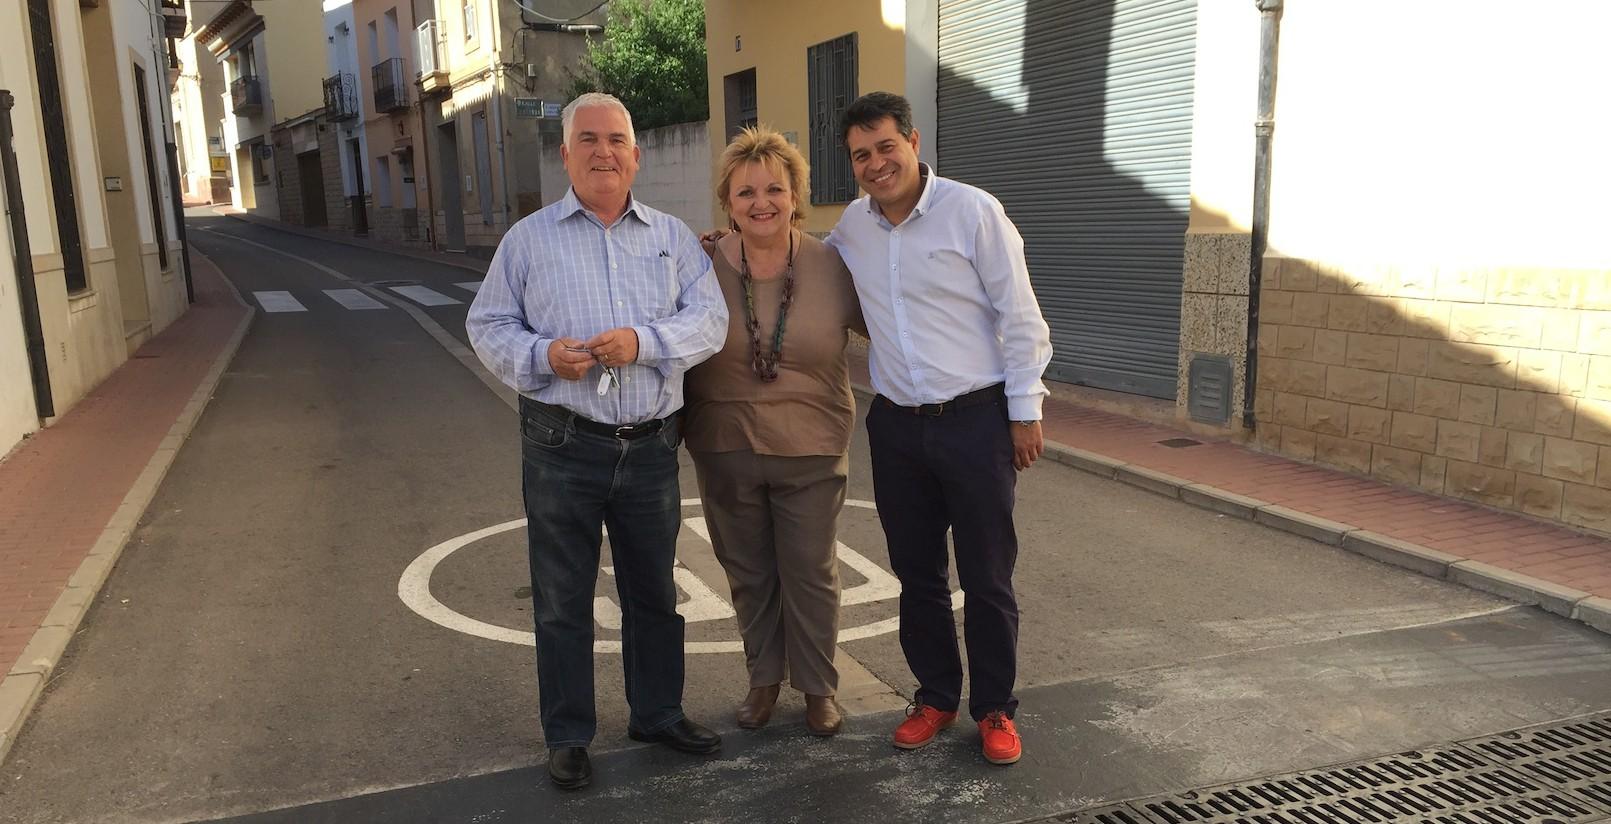 La diputada Mercedes Berenguer durante su visita a los municipios del Camp de Túria.